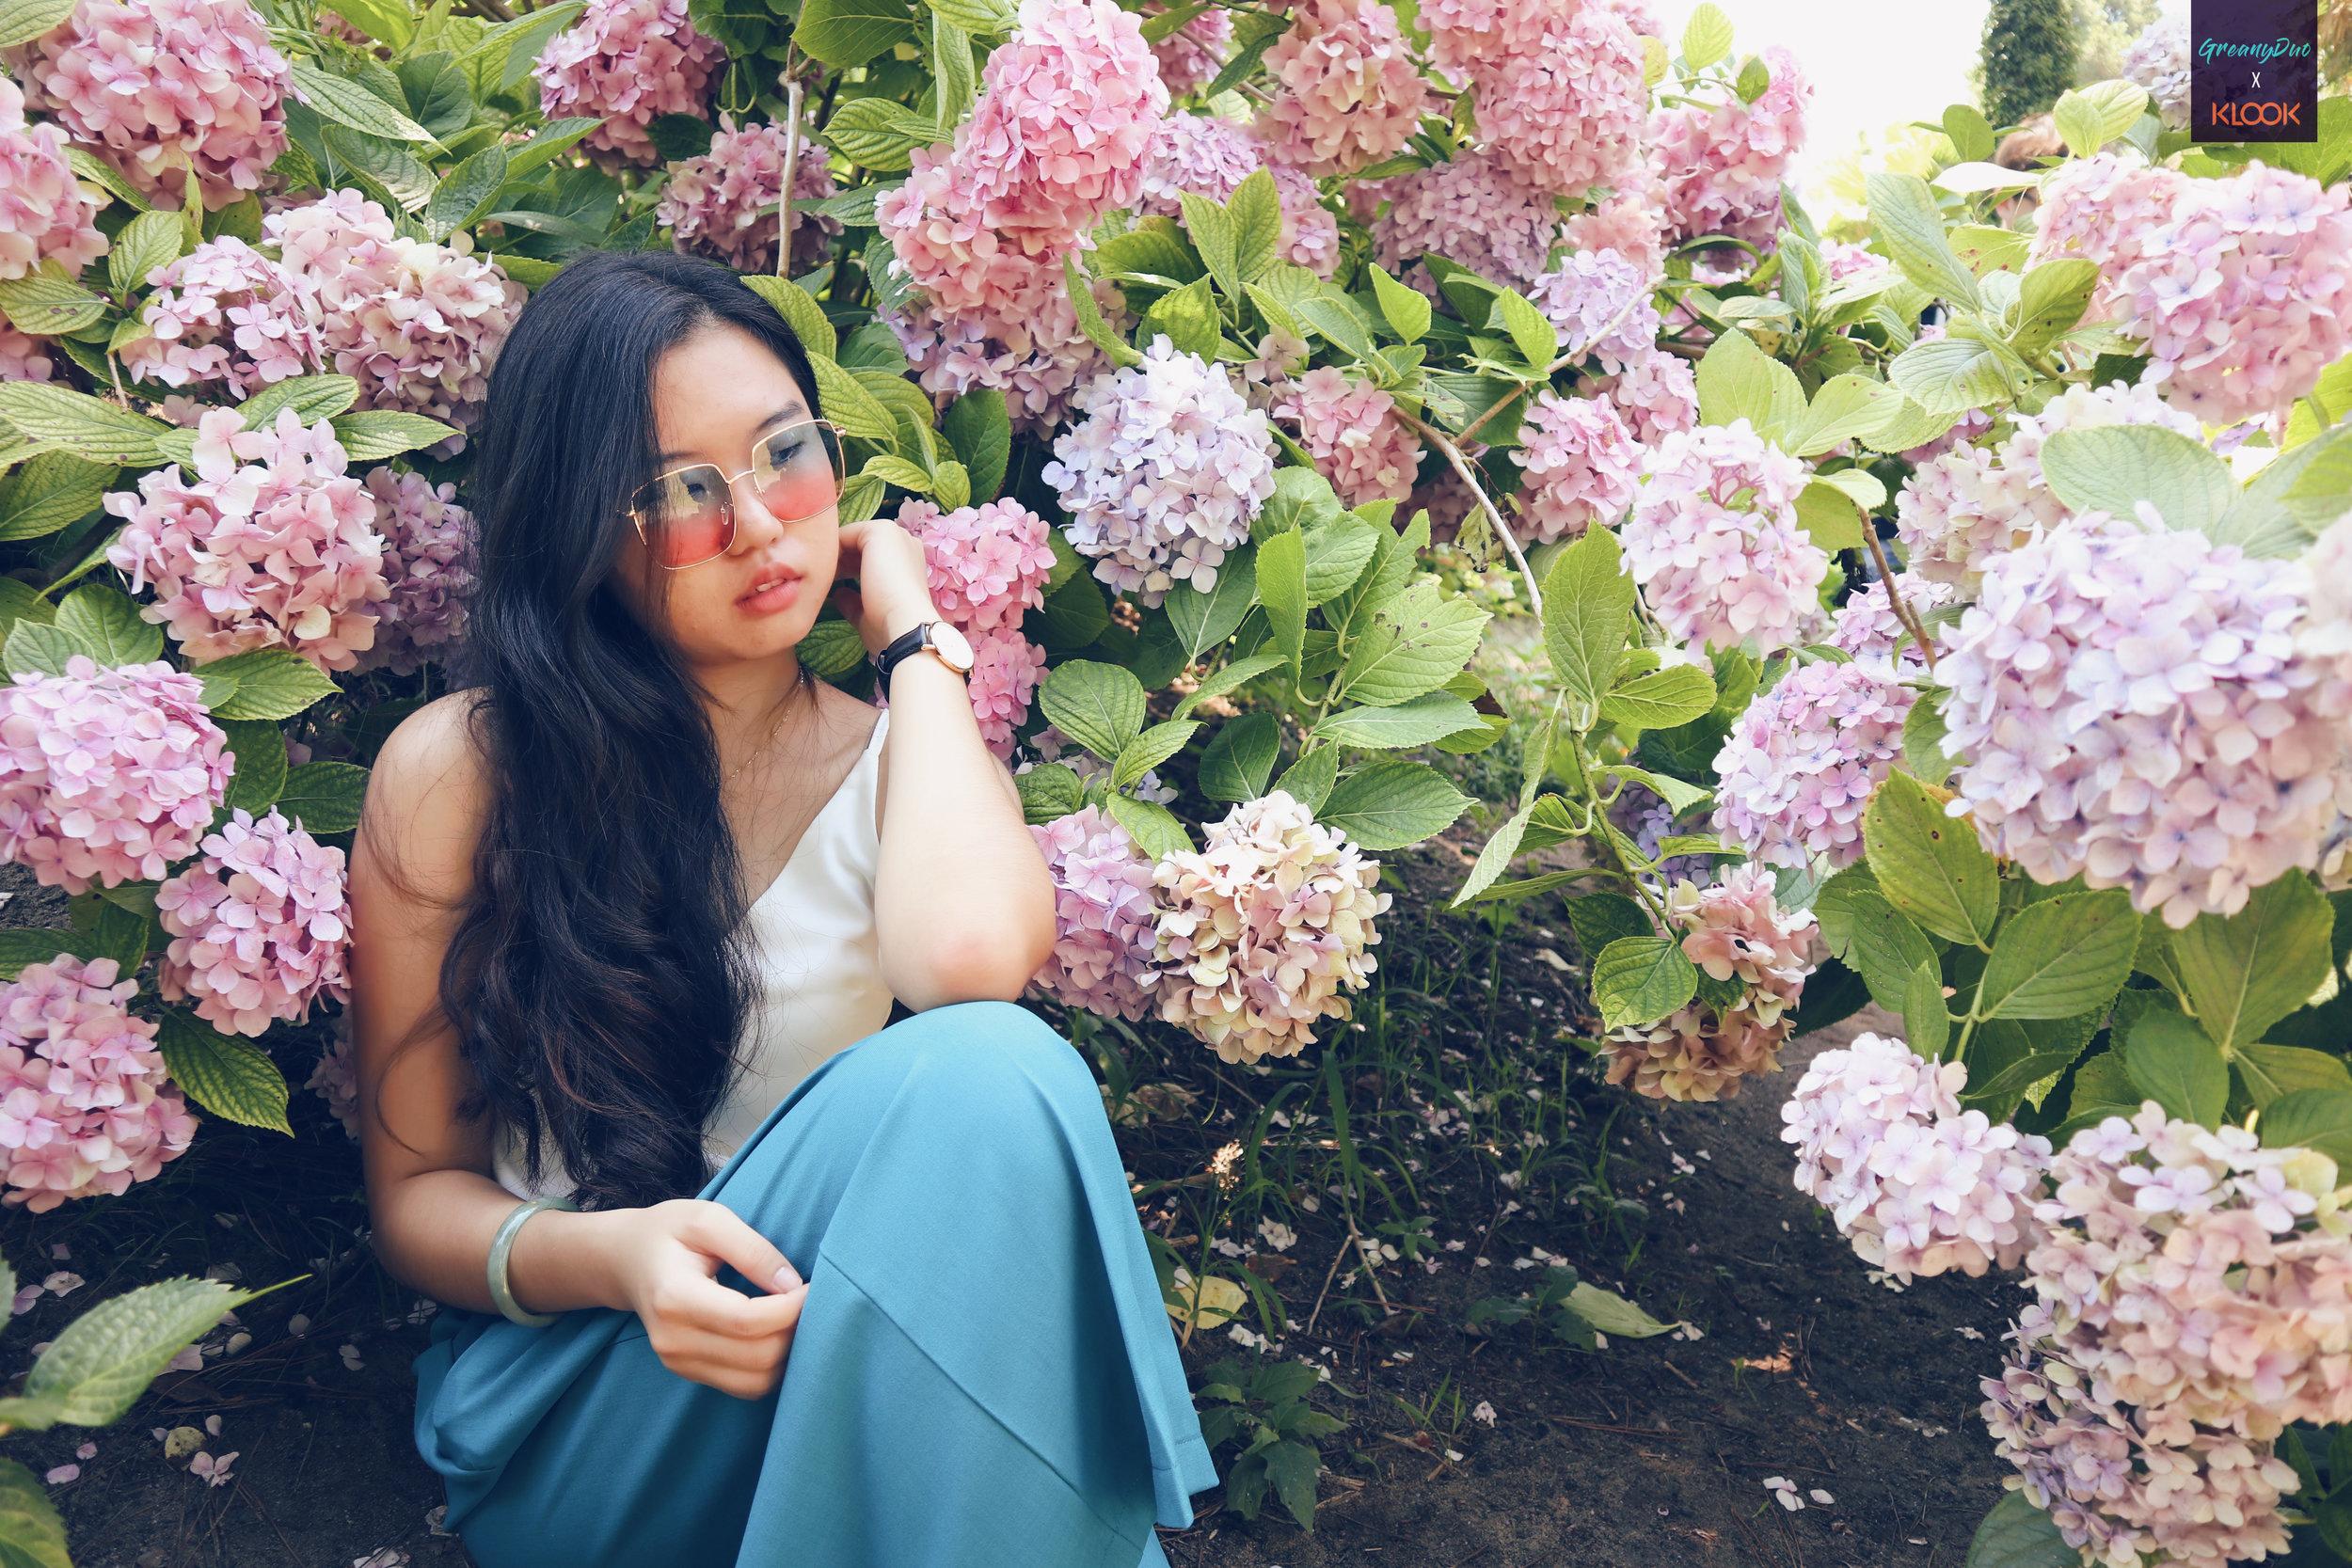 tina posting with hydranges flower at hallim park, jeju